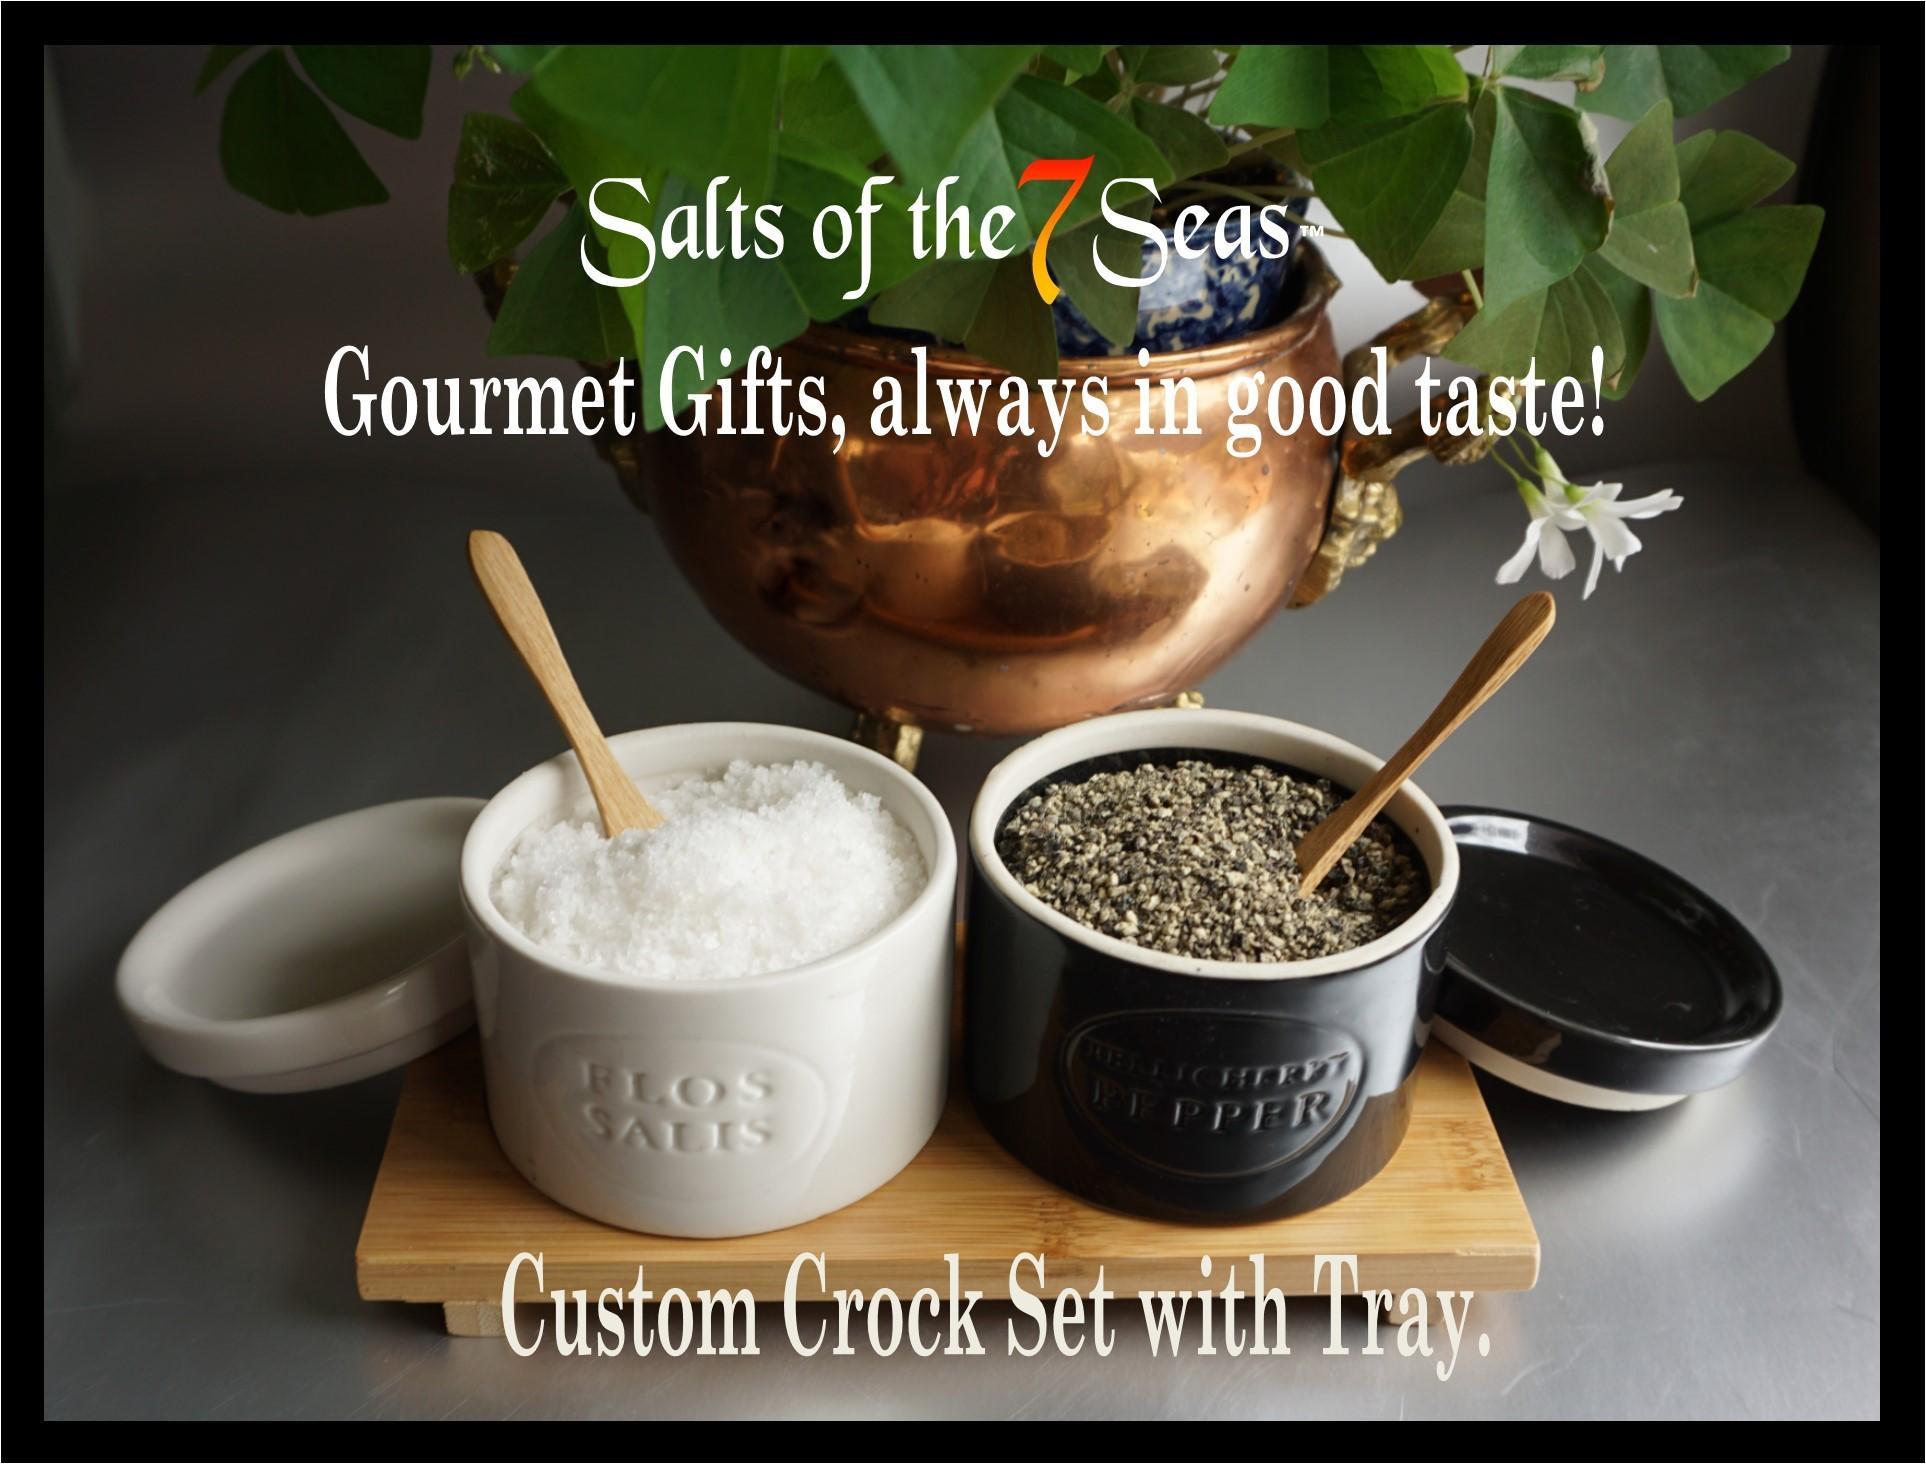 portuguese-crocks-gift-set.jpg